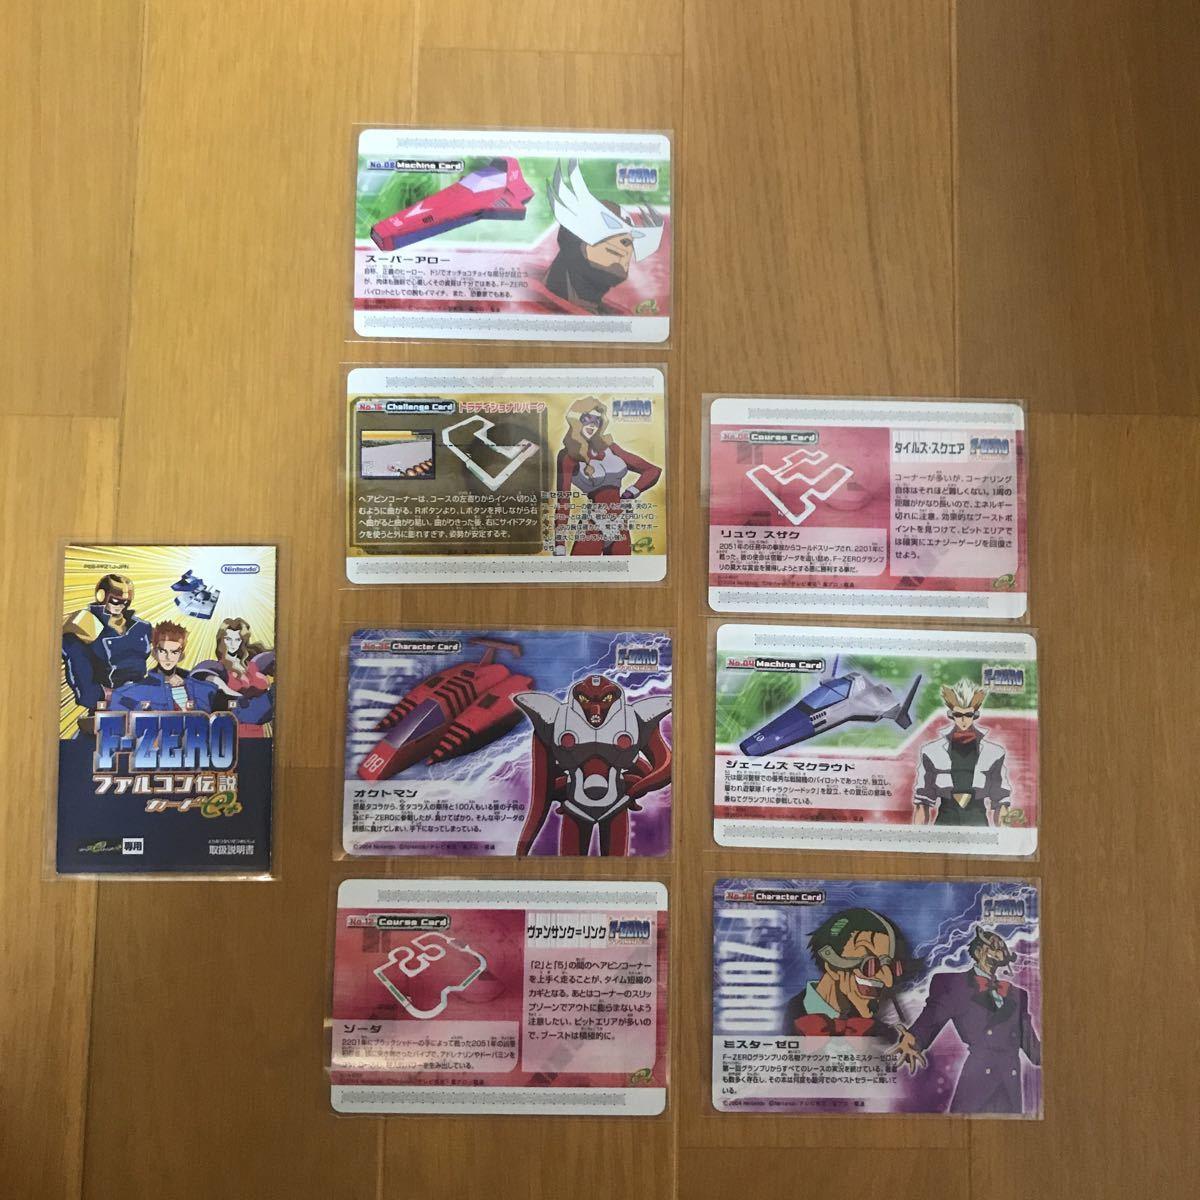 GBA  F-ZERO ファルコン伝説 &【希少】7枚 カードダス版 2枚有り☆ファルコン伝説カードe+ トレカ カード 任天堂 キャプテンファルコン_画像6